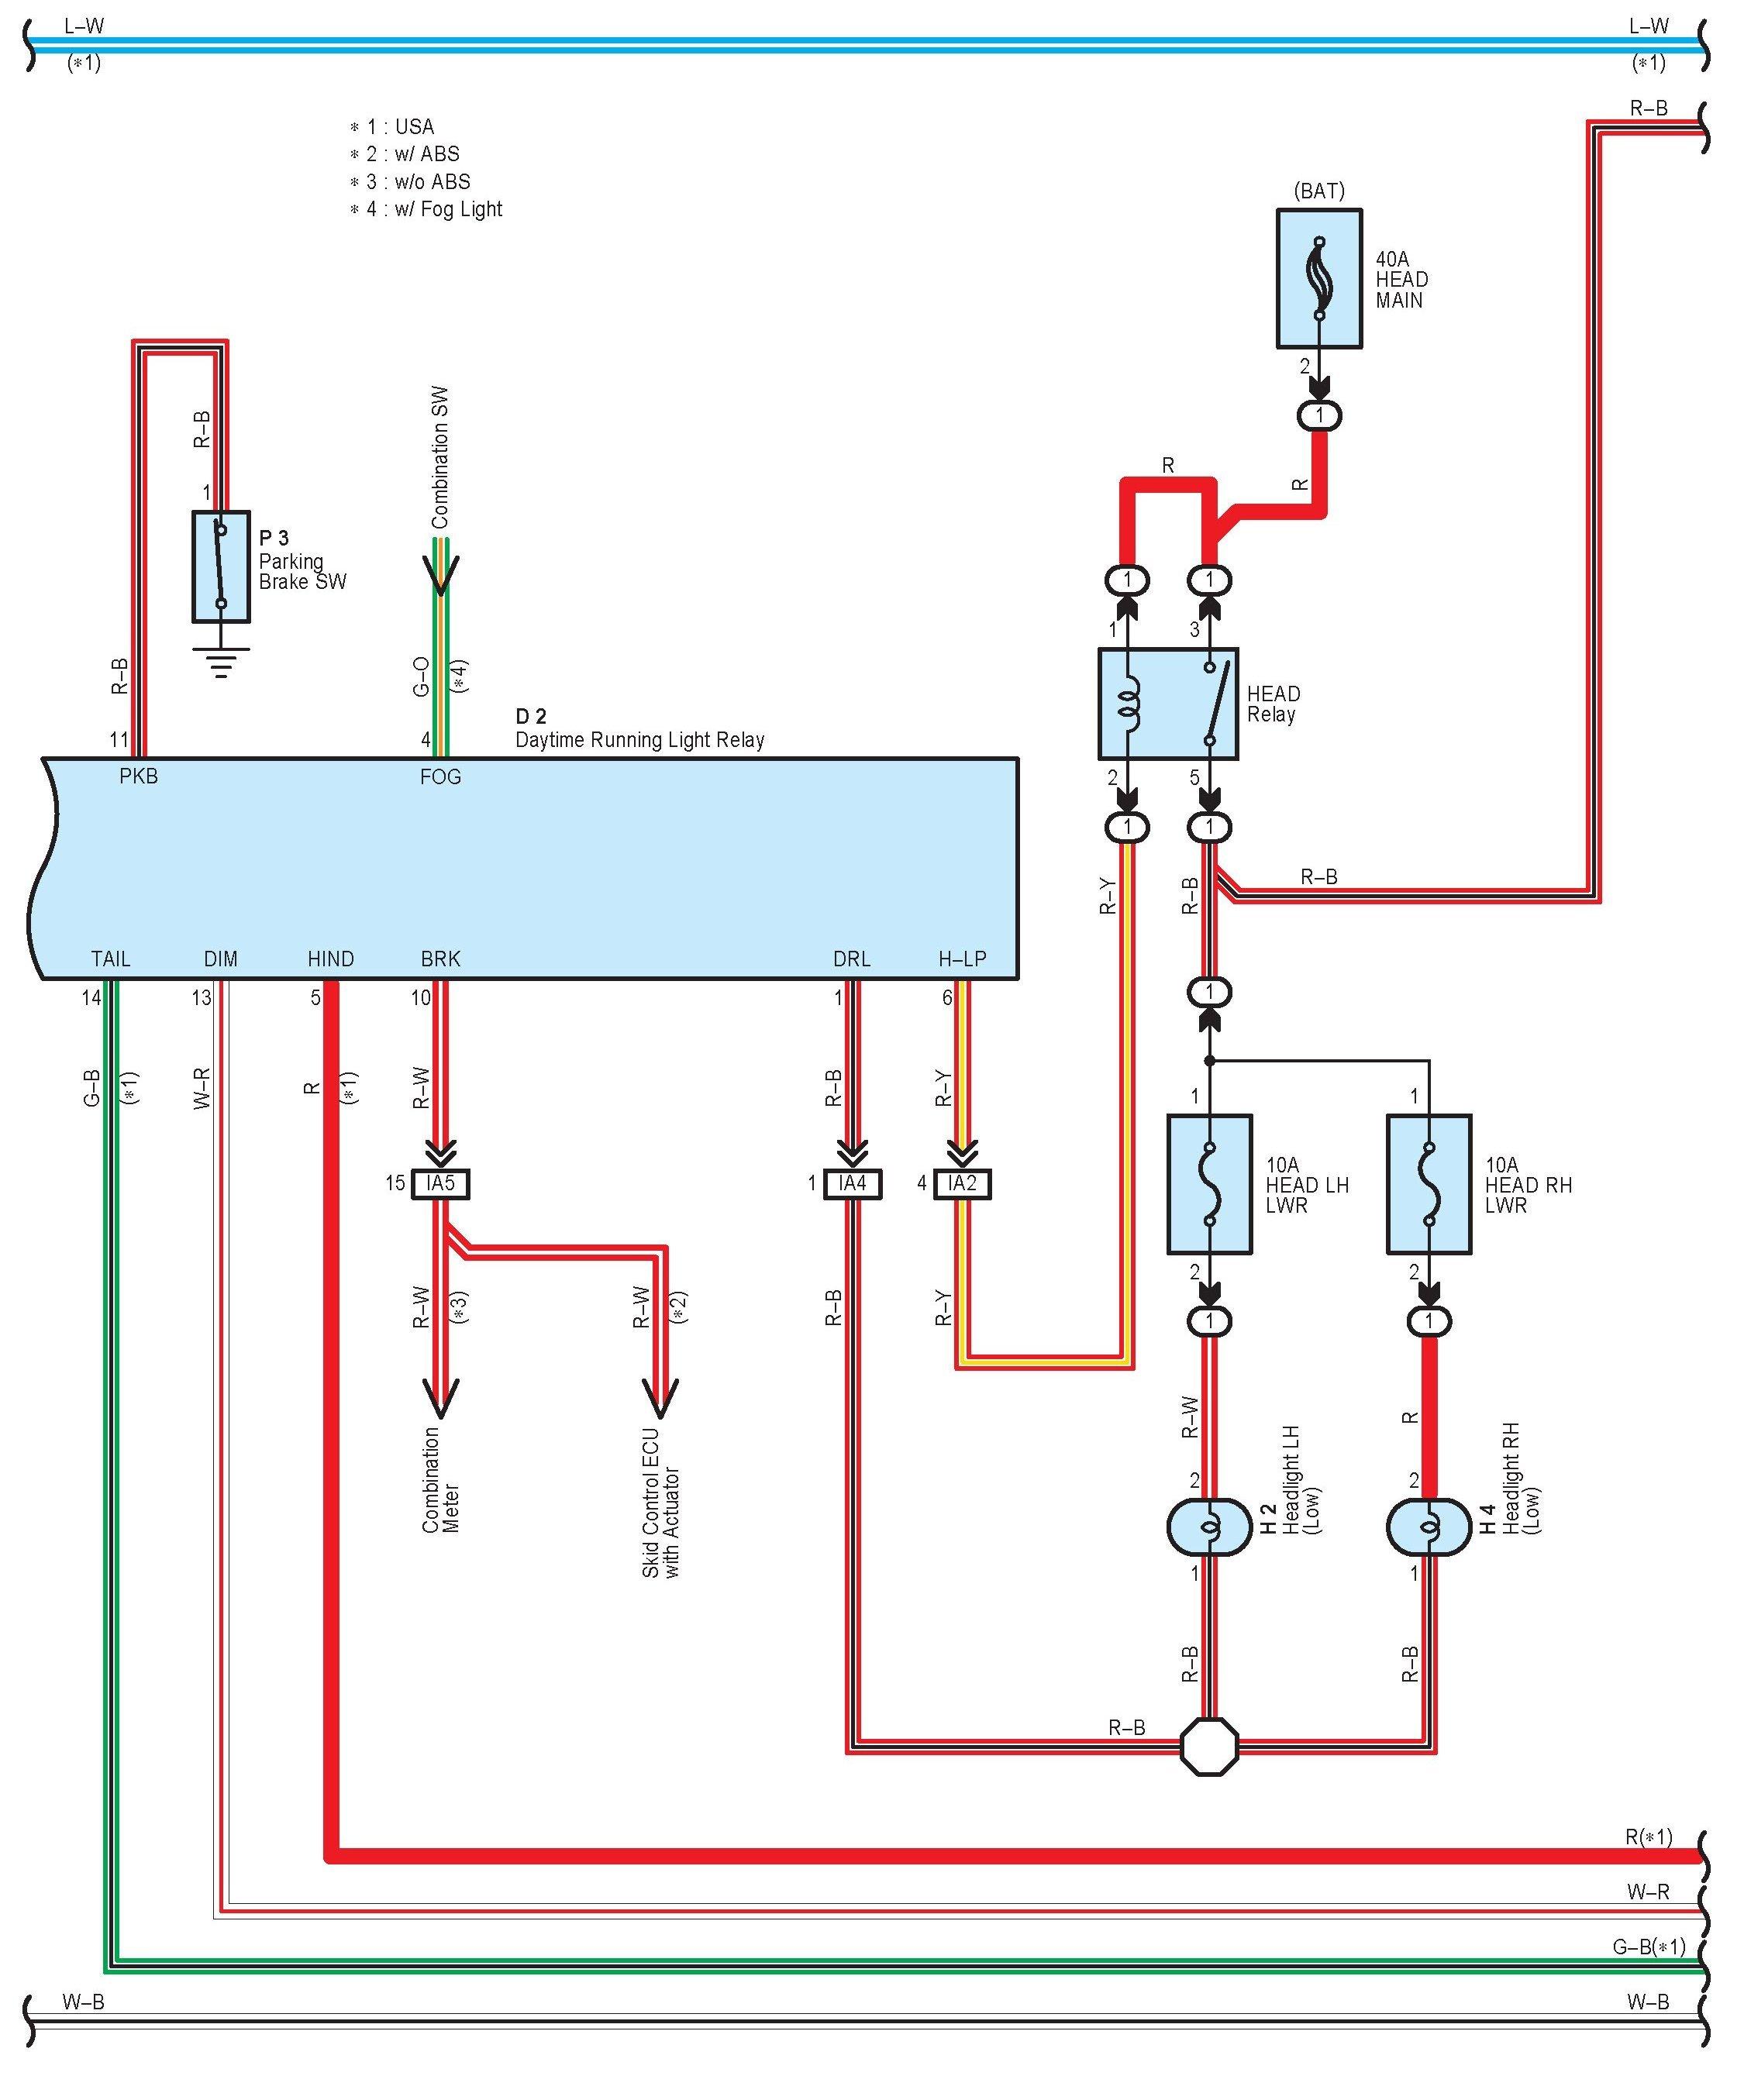 bcd20973-aee5-4a57-92cb-d83ffd9966db_schematic.jpg